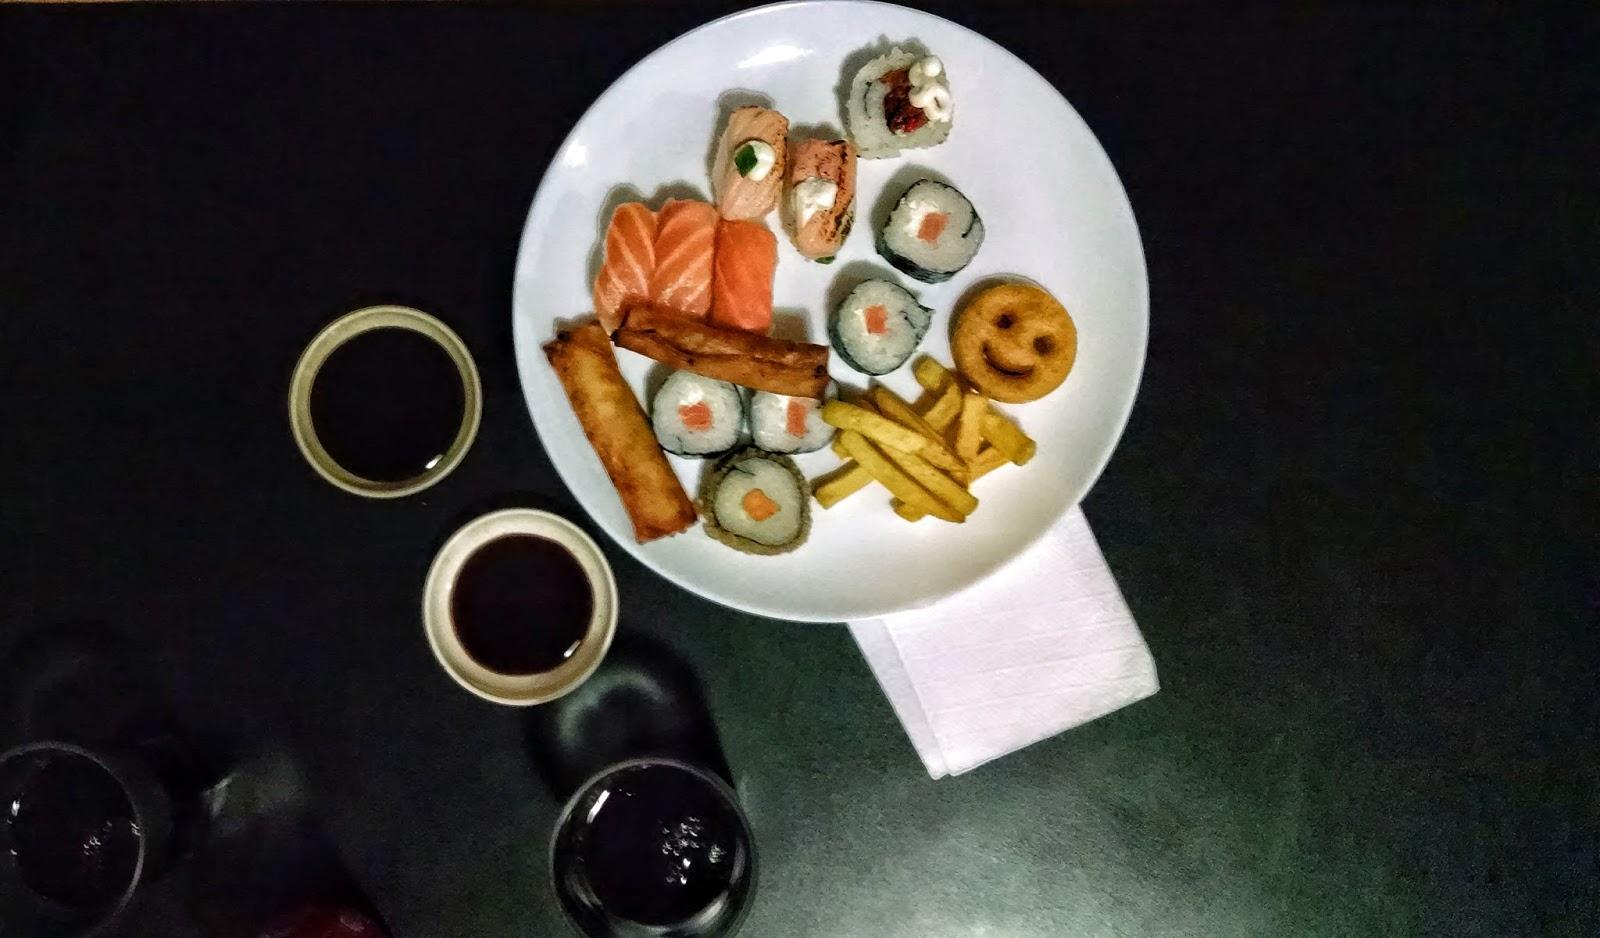 rodizio sushi fortaleza, rodizio fortaleza, rodizio sushi fortaleza, rodizio fortaleza, rodizio sushi fortaleza, rodizio fortaleza, rodizio sushi fortaleza, rodizio fortaleza,